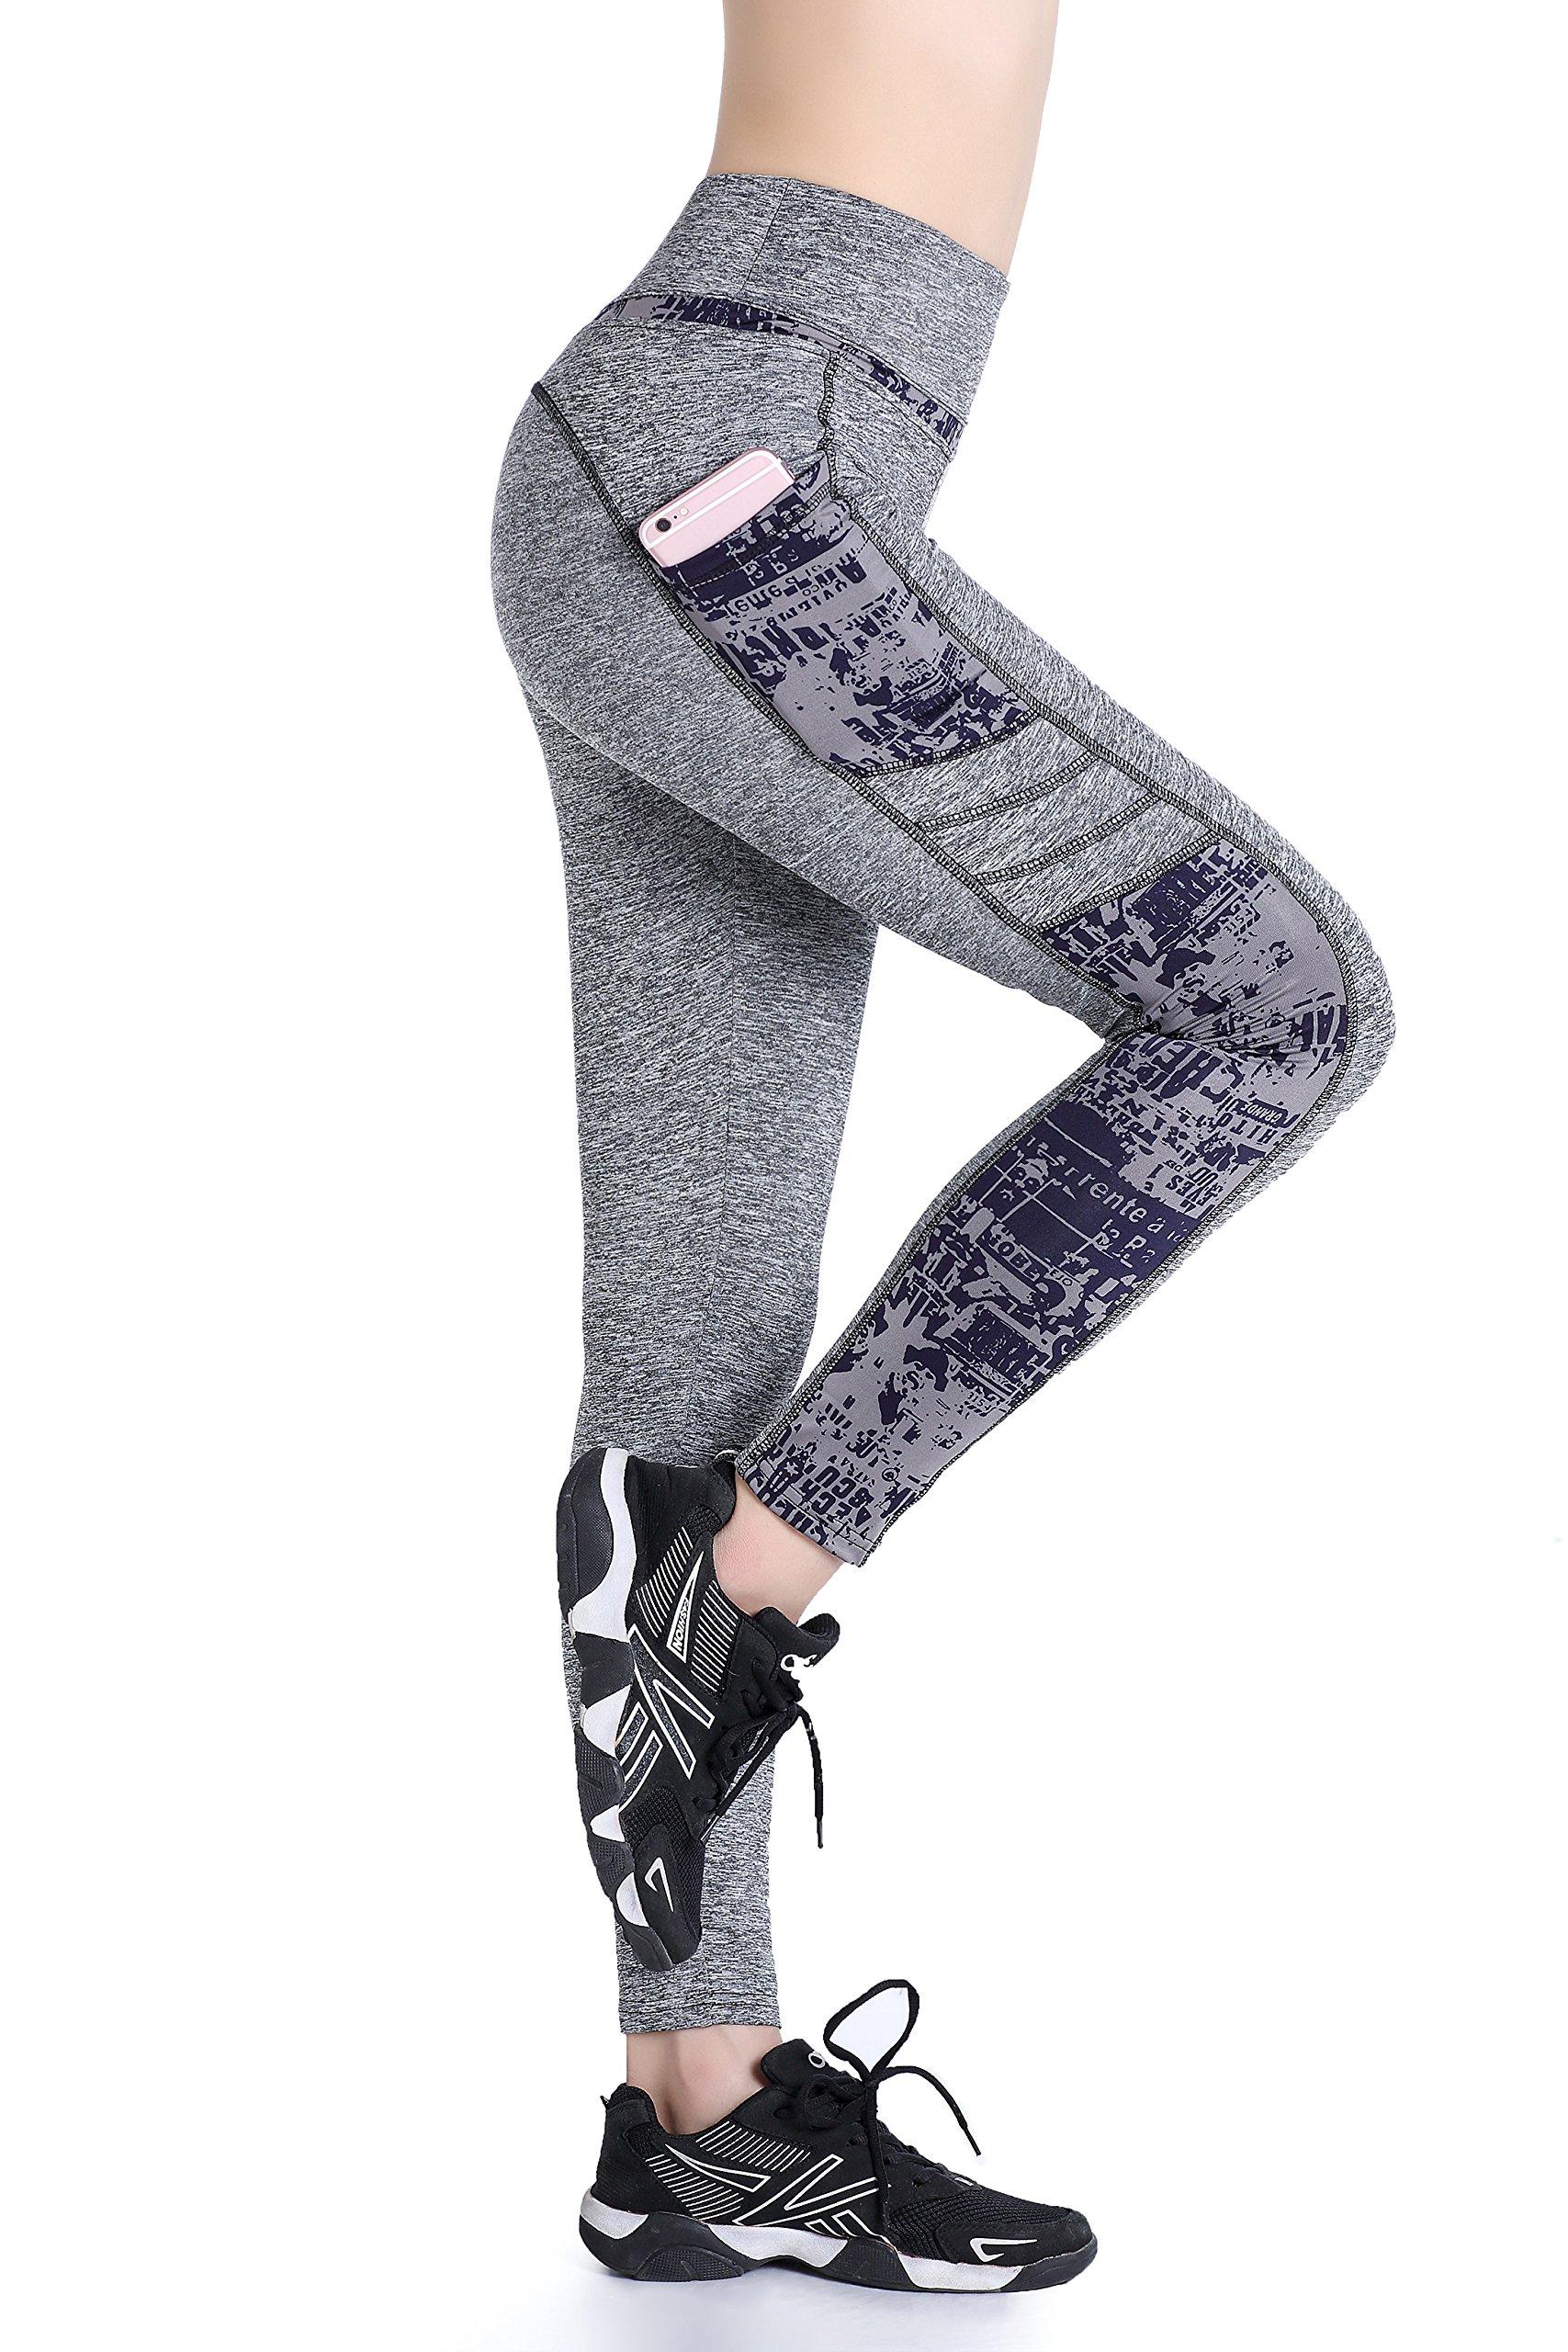 91Eao3v13hL - EAST HONG Women's Yoga Gym Leggings Lycar Active Sports Clothes Fitness Pants 2 Side Pockets